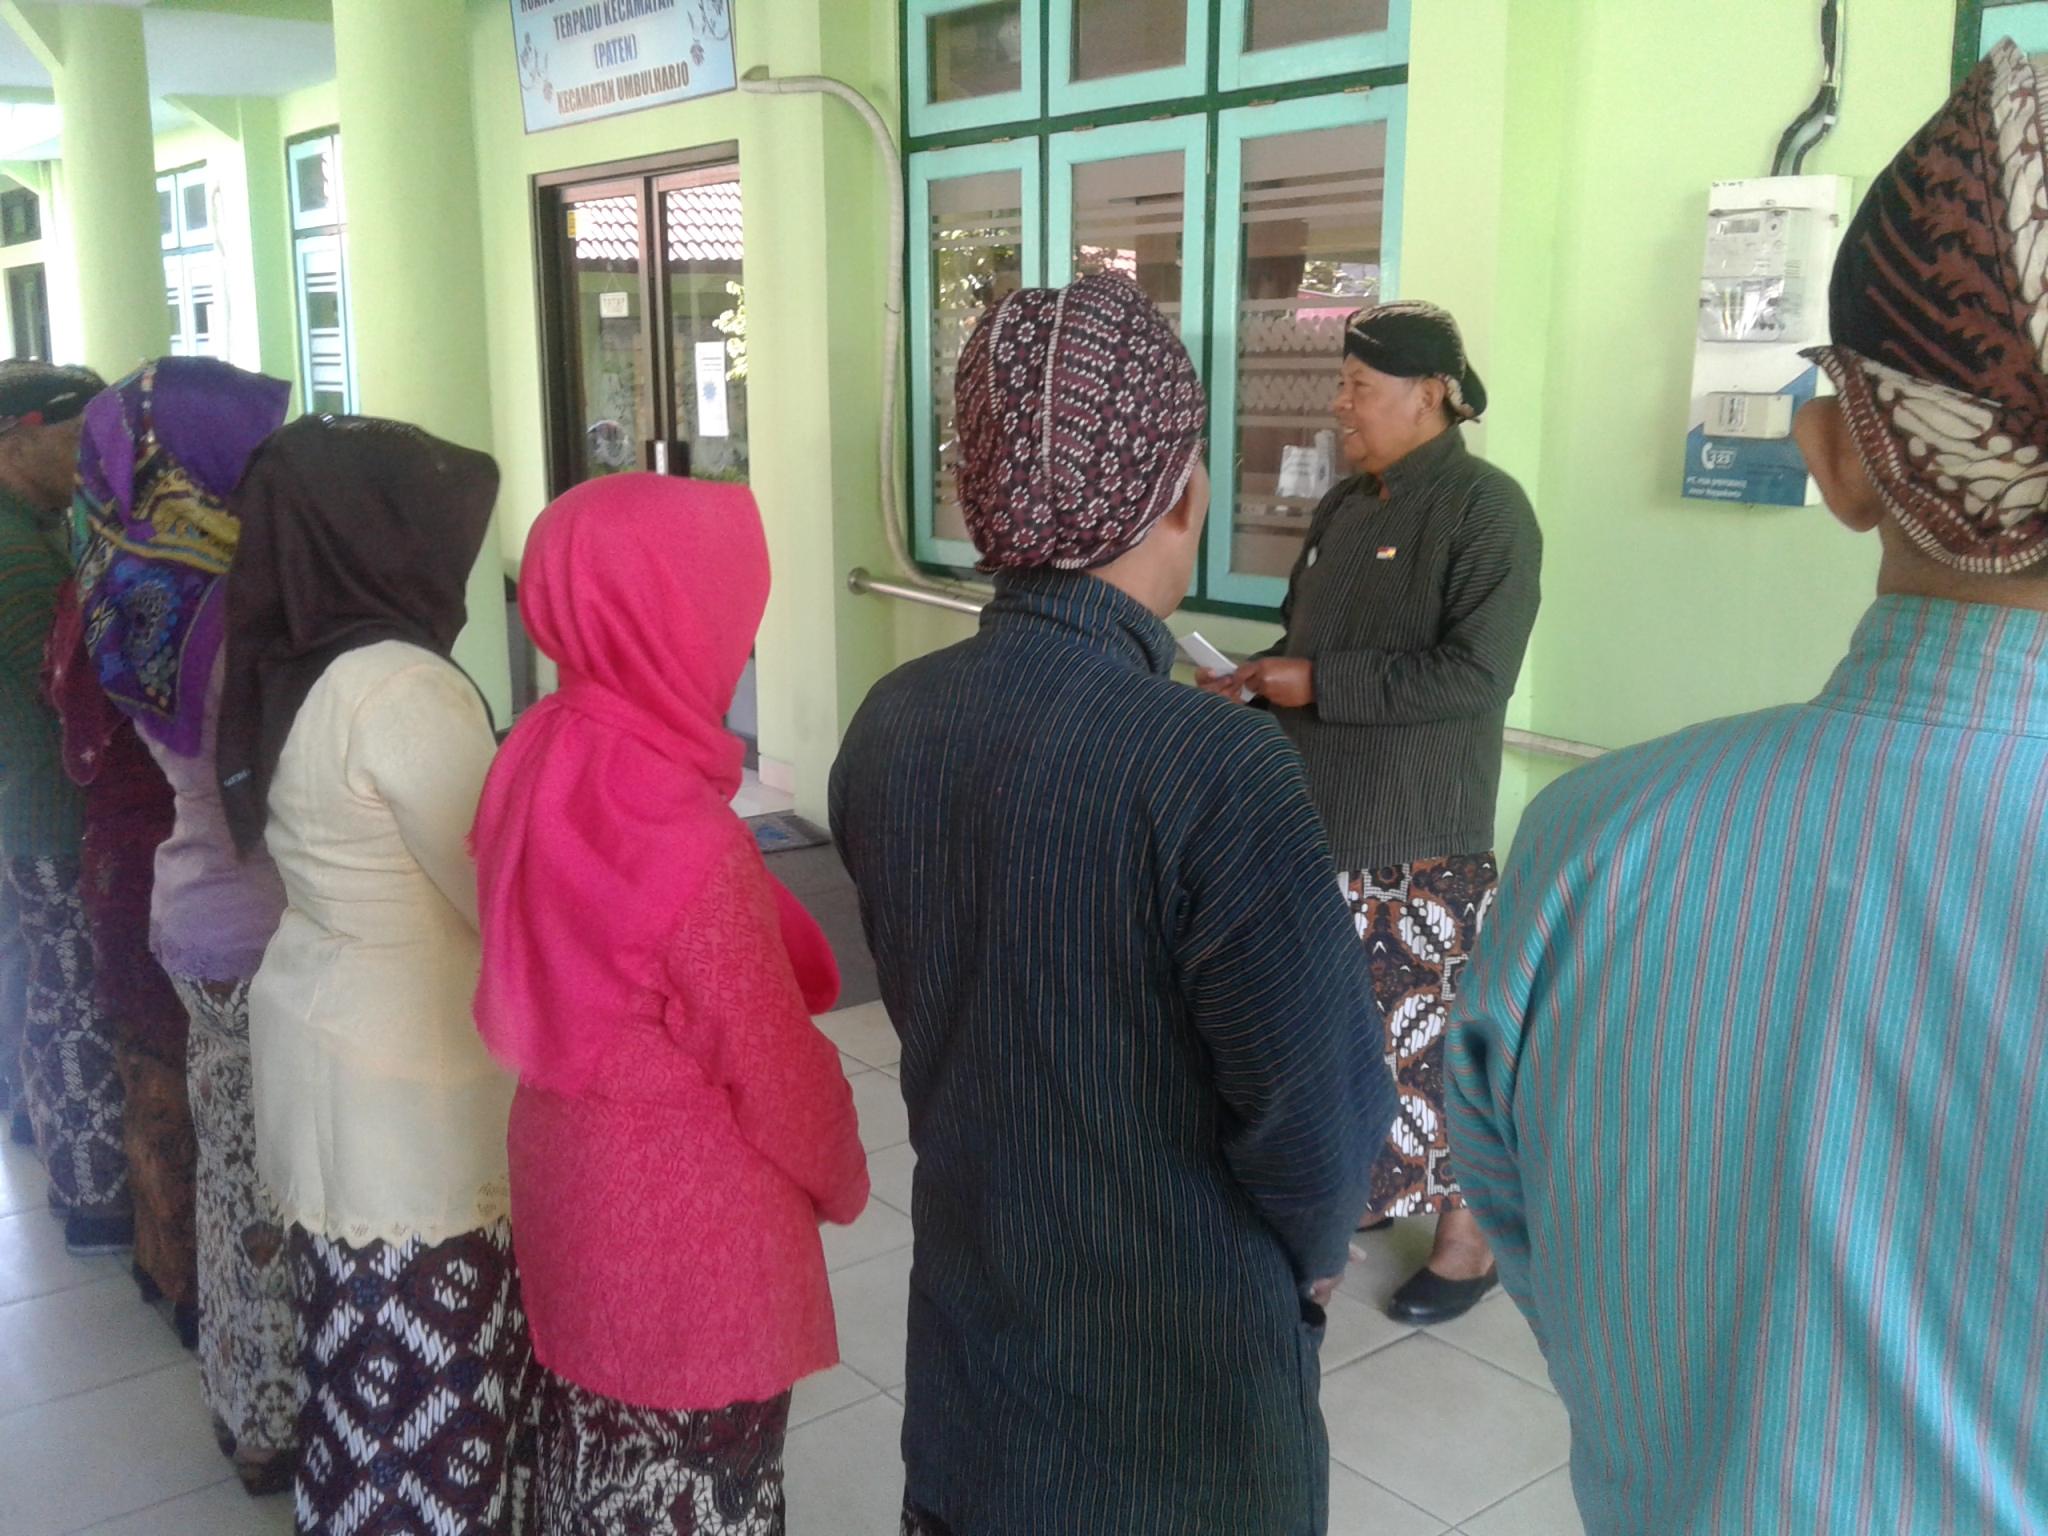 Apel Pagi Karyawan Karyawati dengan Pakaian Jawa Gagrak Ngayogyokarto